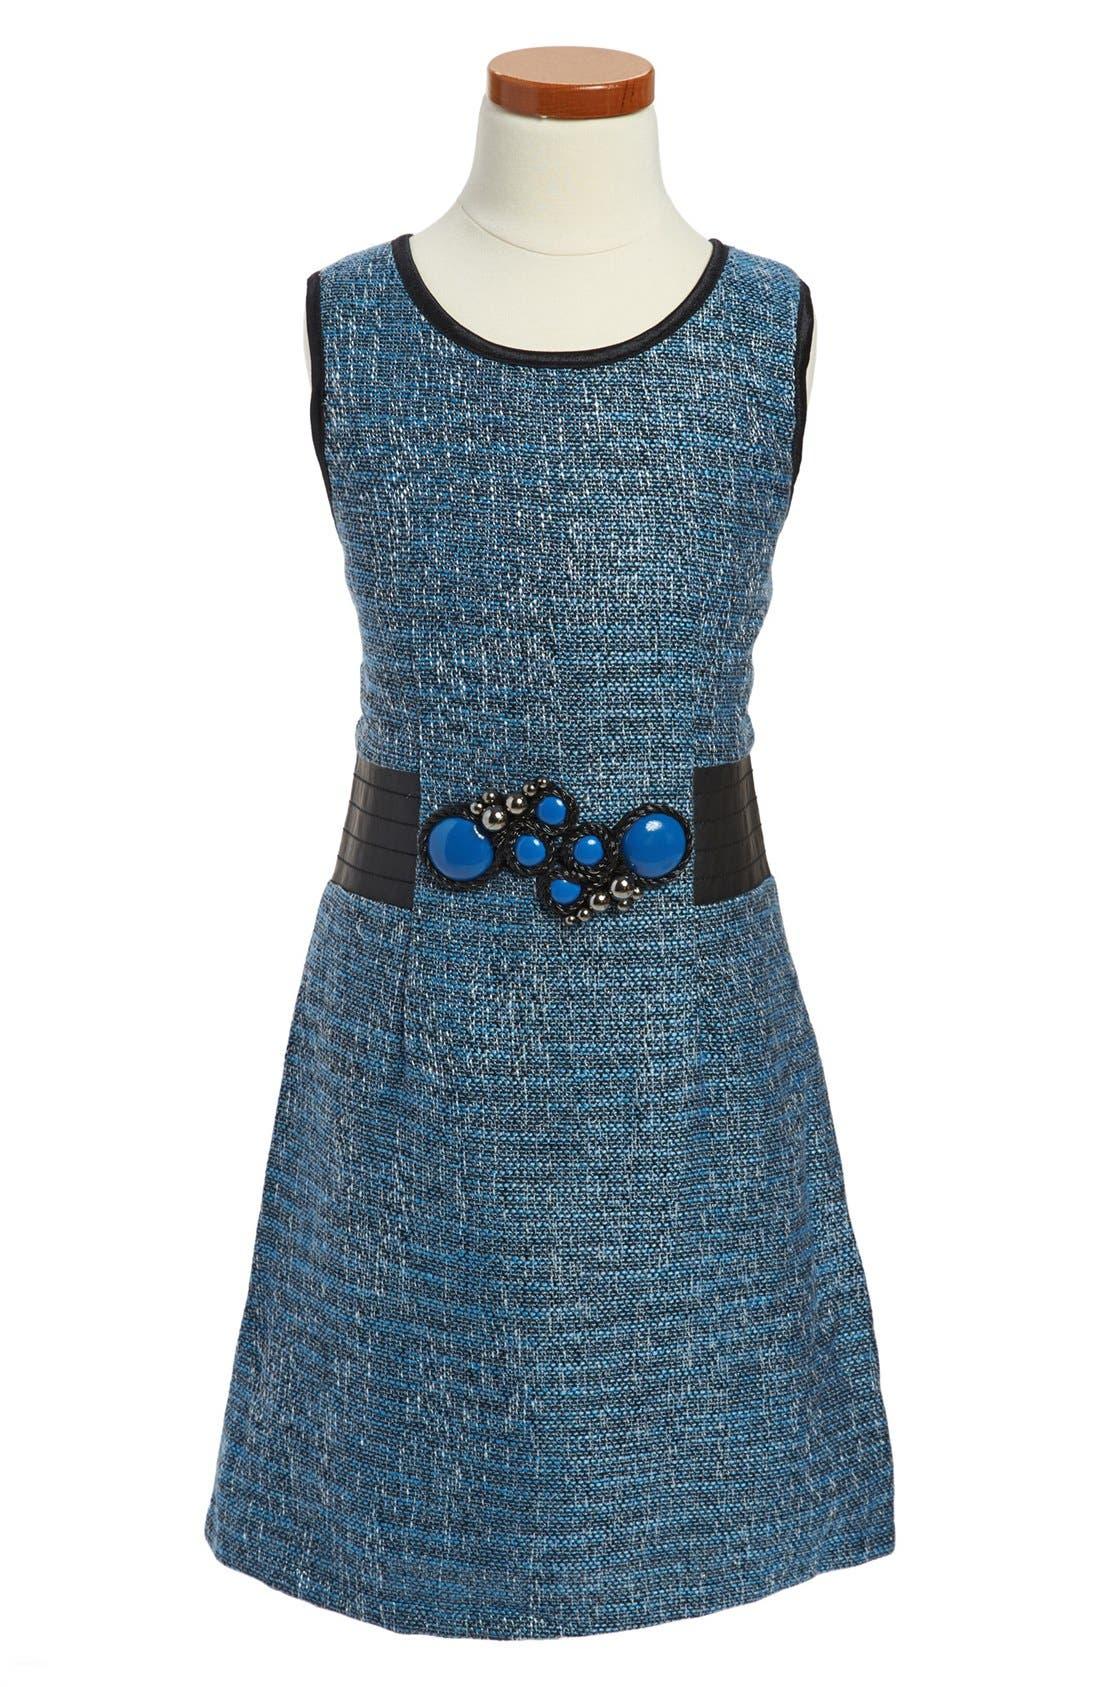 Main Image - Laundry by Shelli Segal 'Gemma' Tweed Dress (Big Girls)